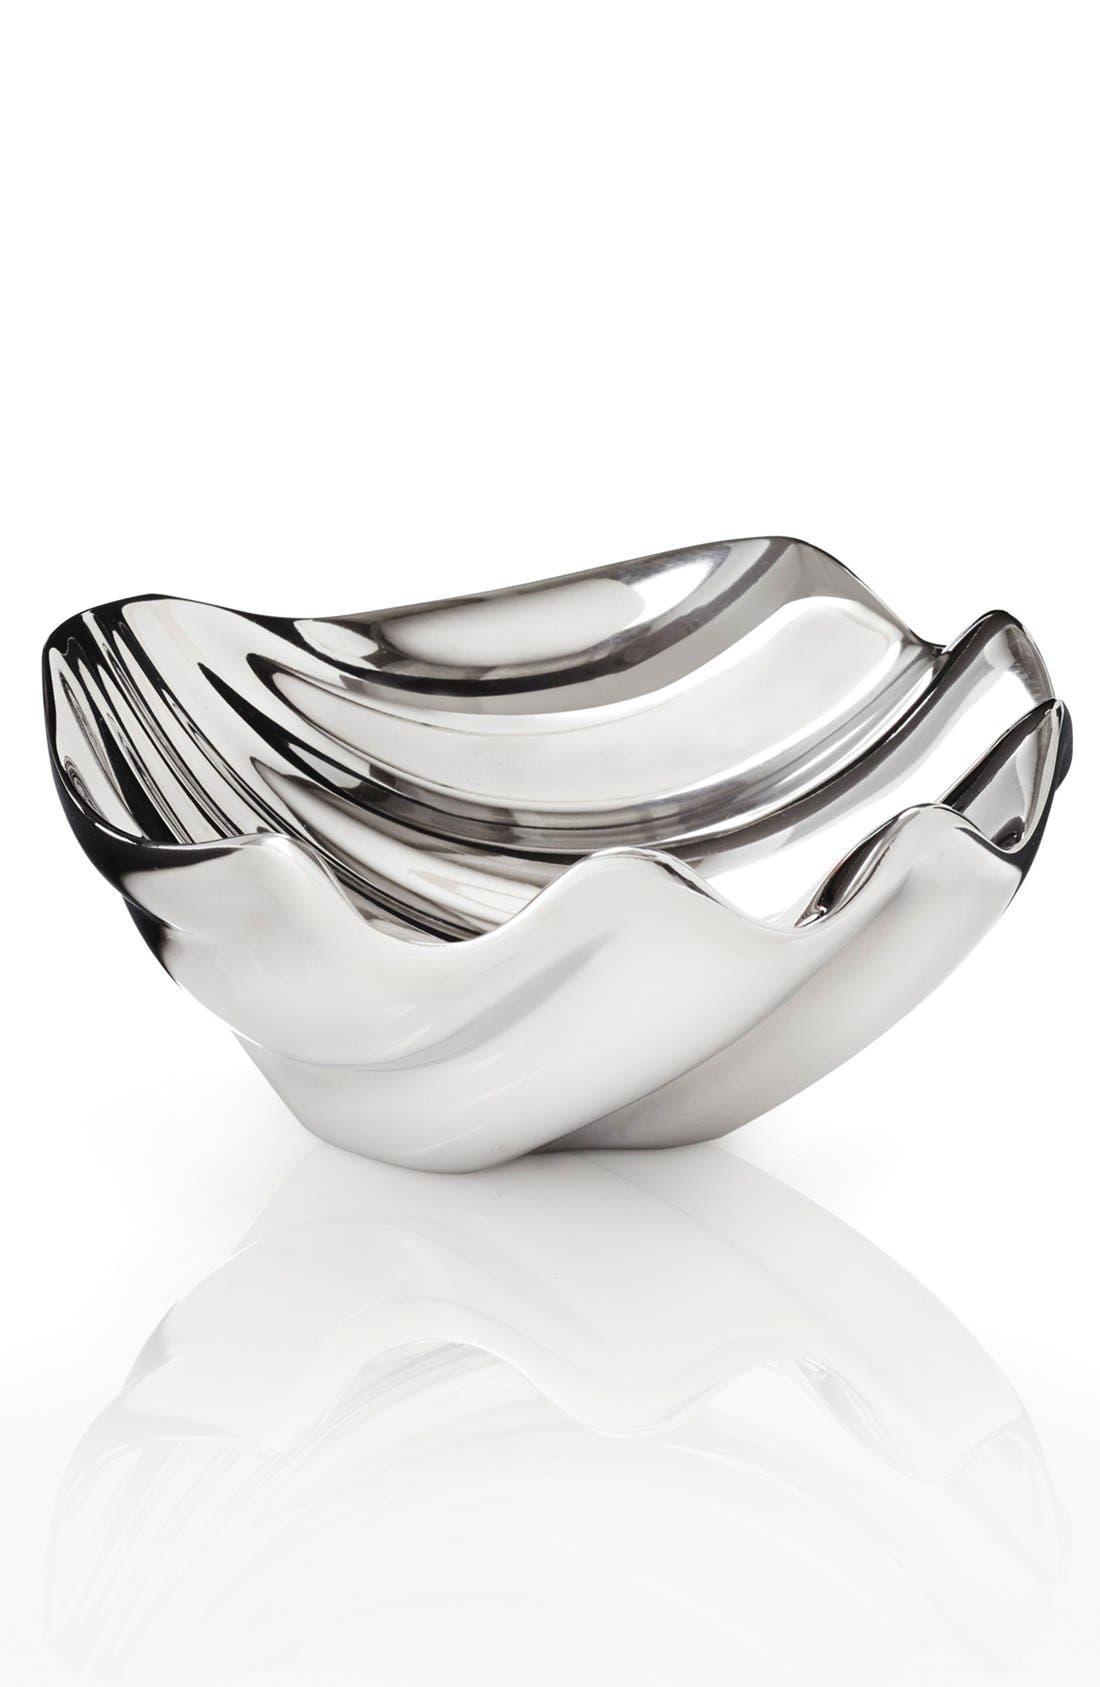 Alternate Image 1 Selected - Nambé 'Oceana' Seashell Dip Bowl